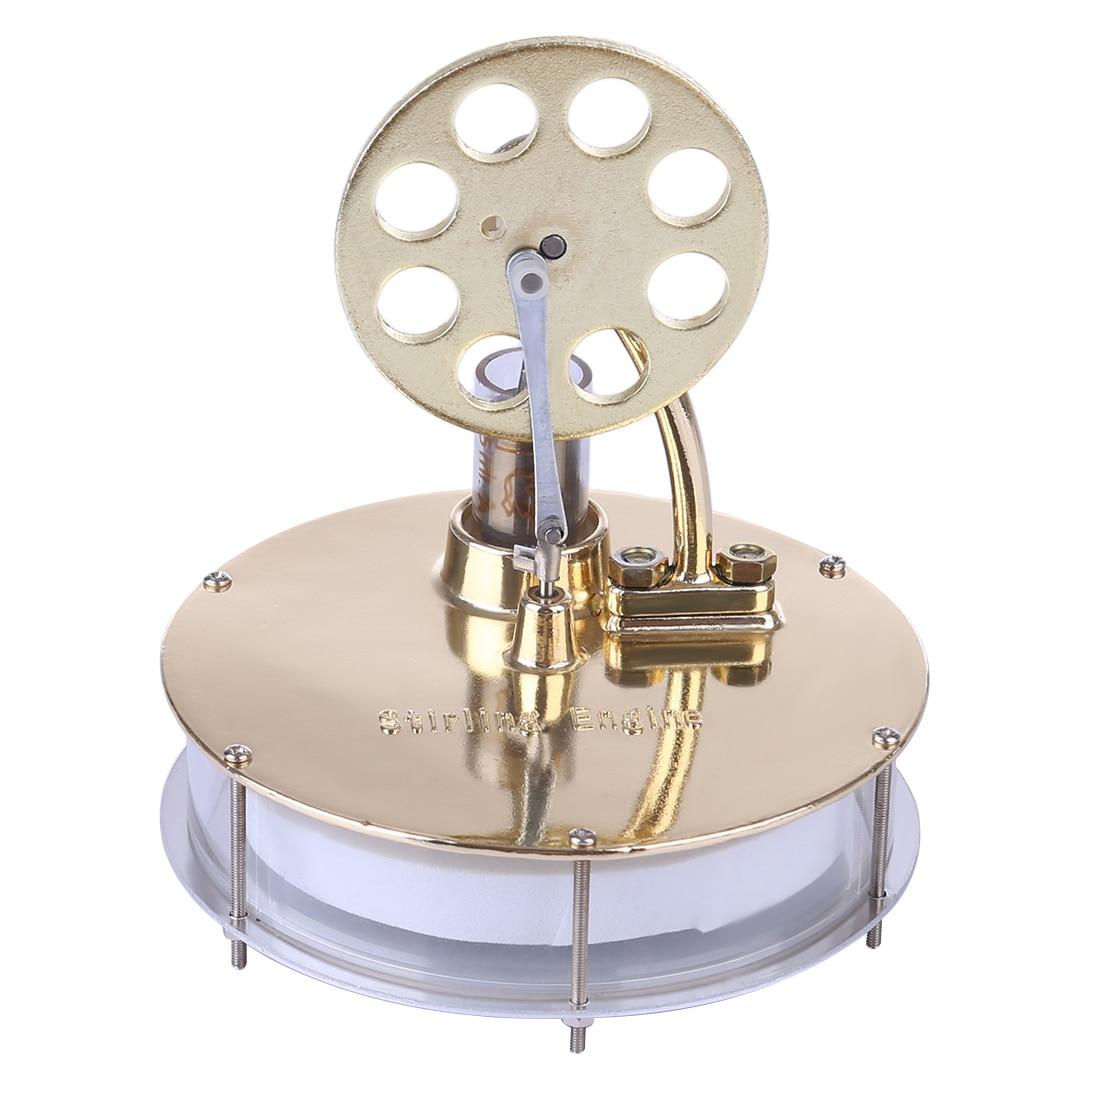 NFSTRIKE Low Temperature Stirling Engine Model Power Educational DIY Model Toy For Kids Adults 2019  - Golden